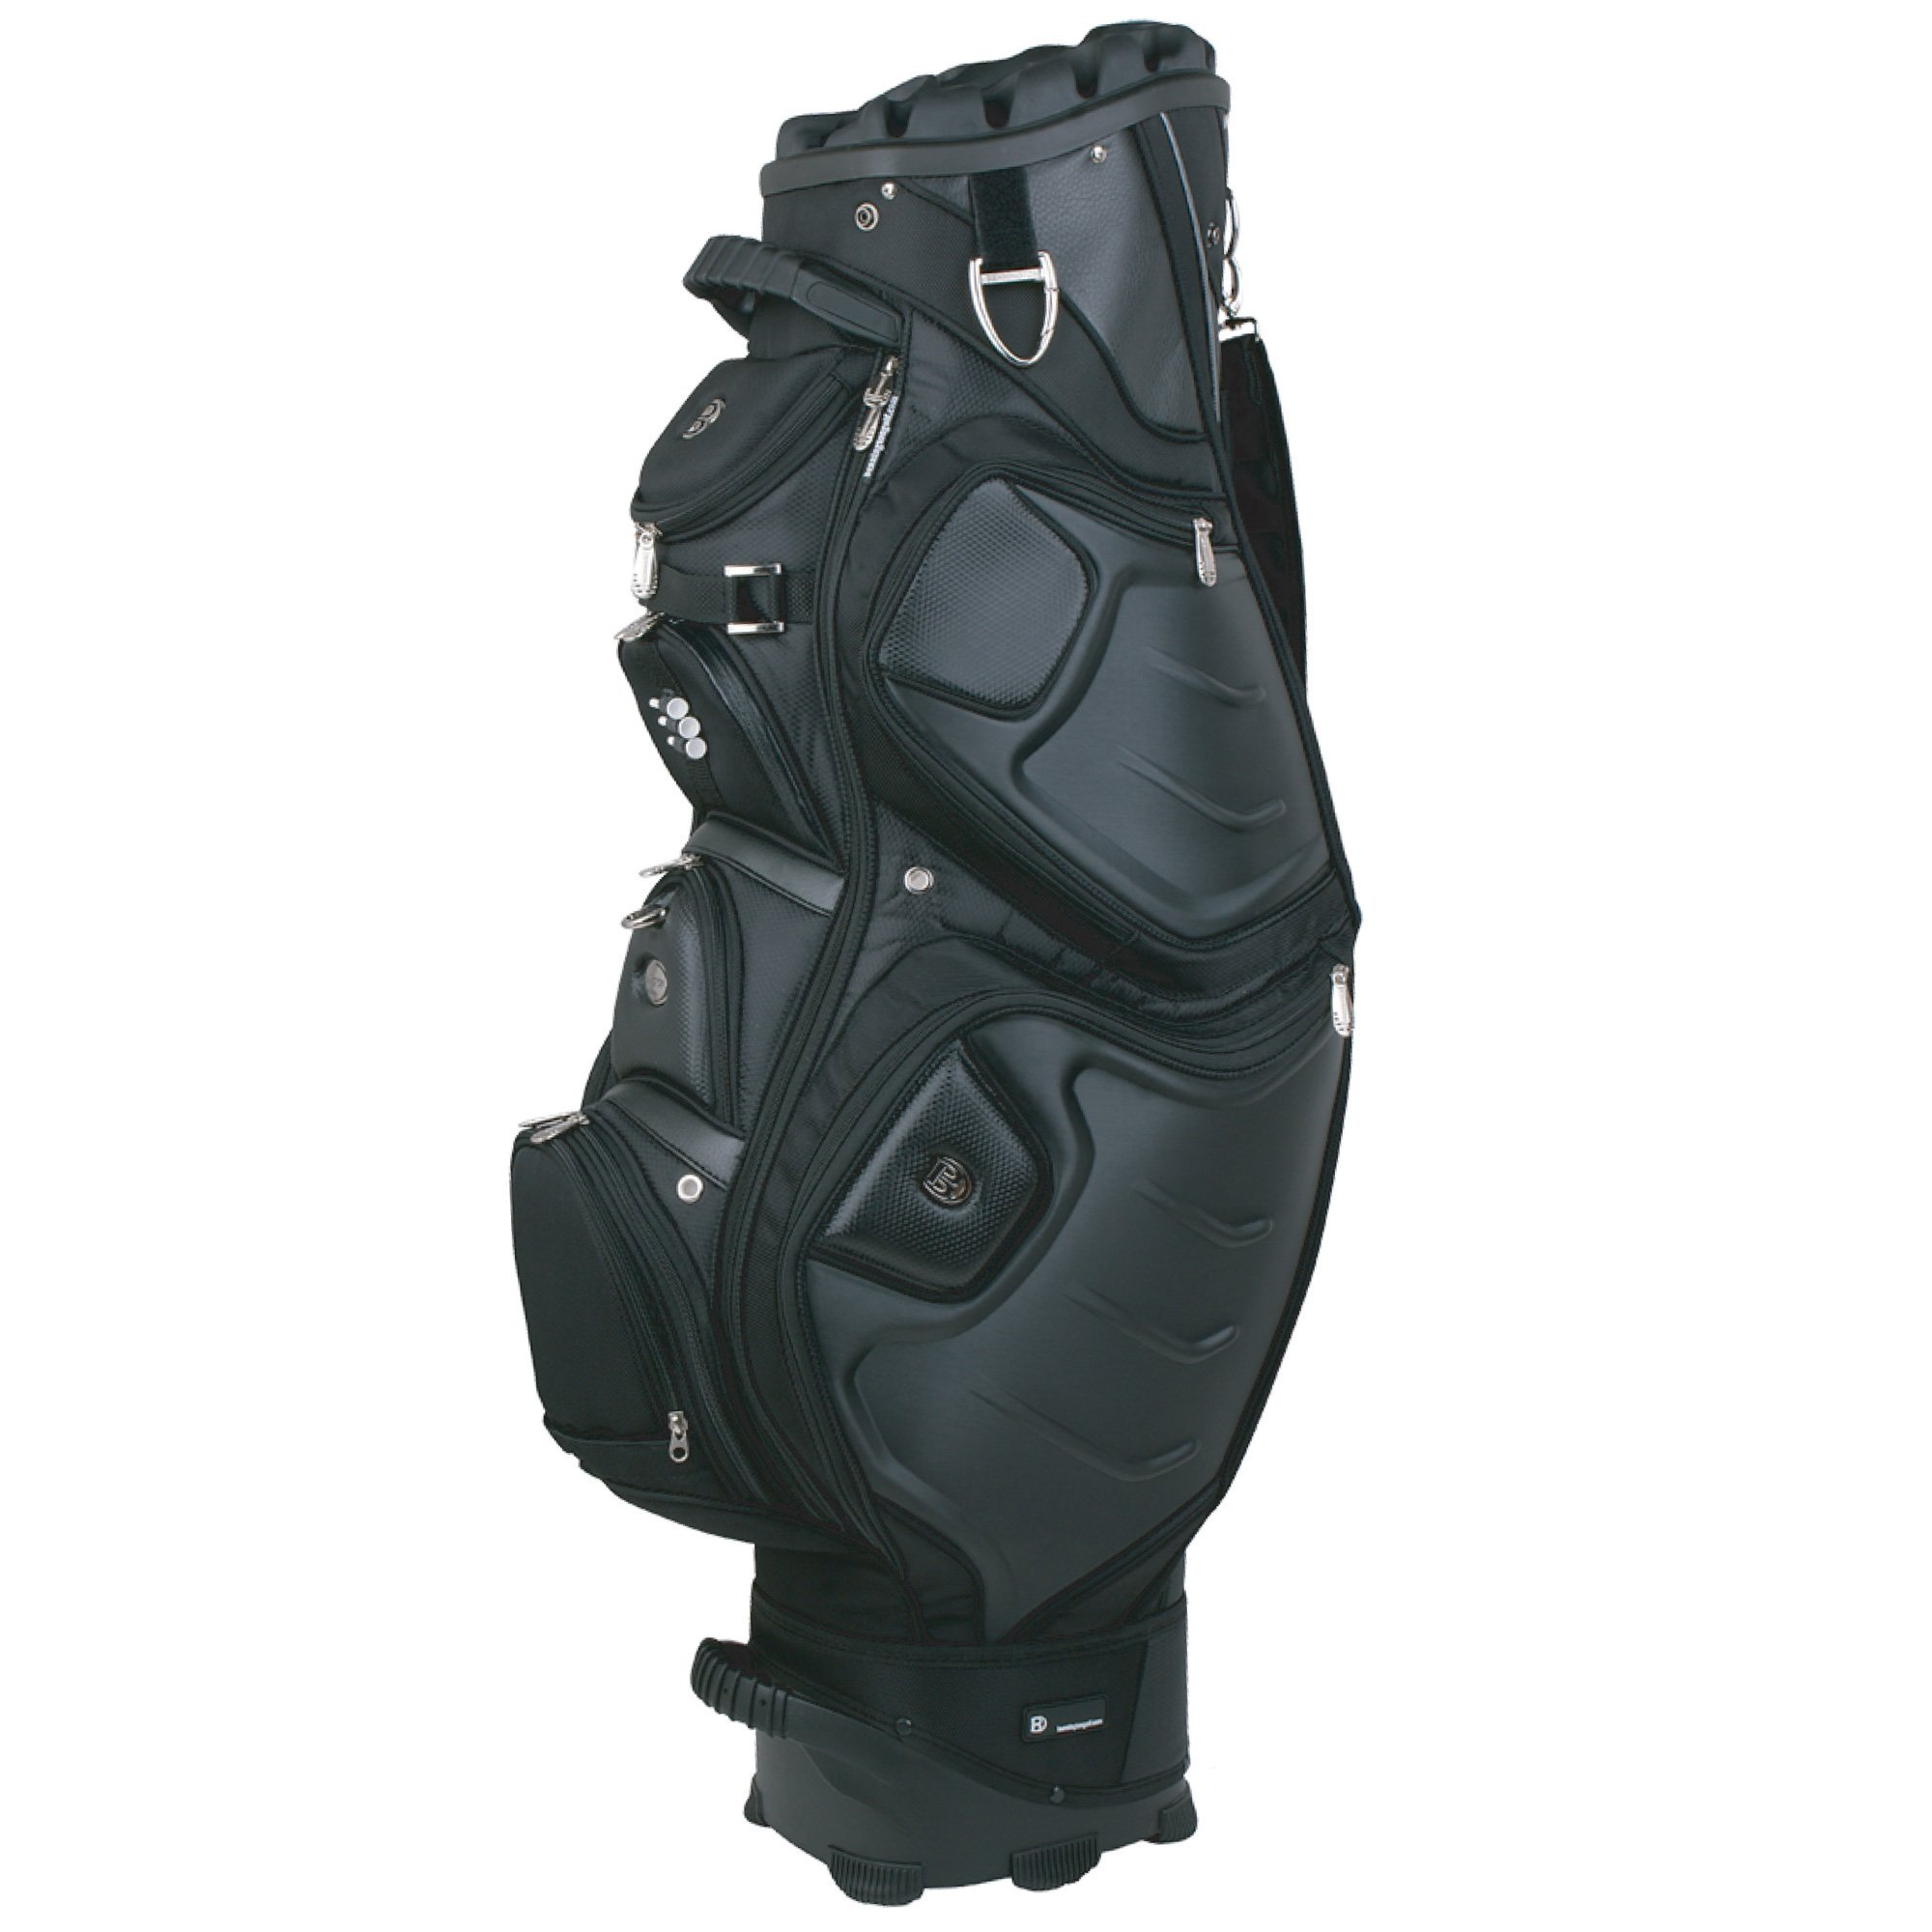 Bennington Golf Quiet Organizer 12 Slot Golf Bag with Full Length Dividers in Mocha